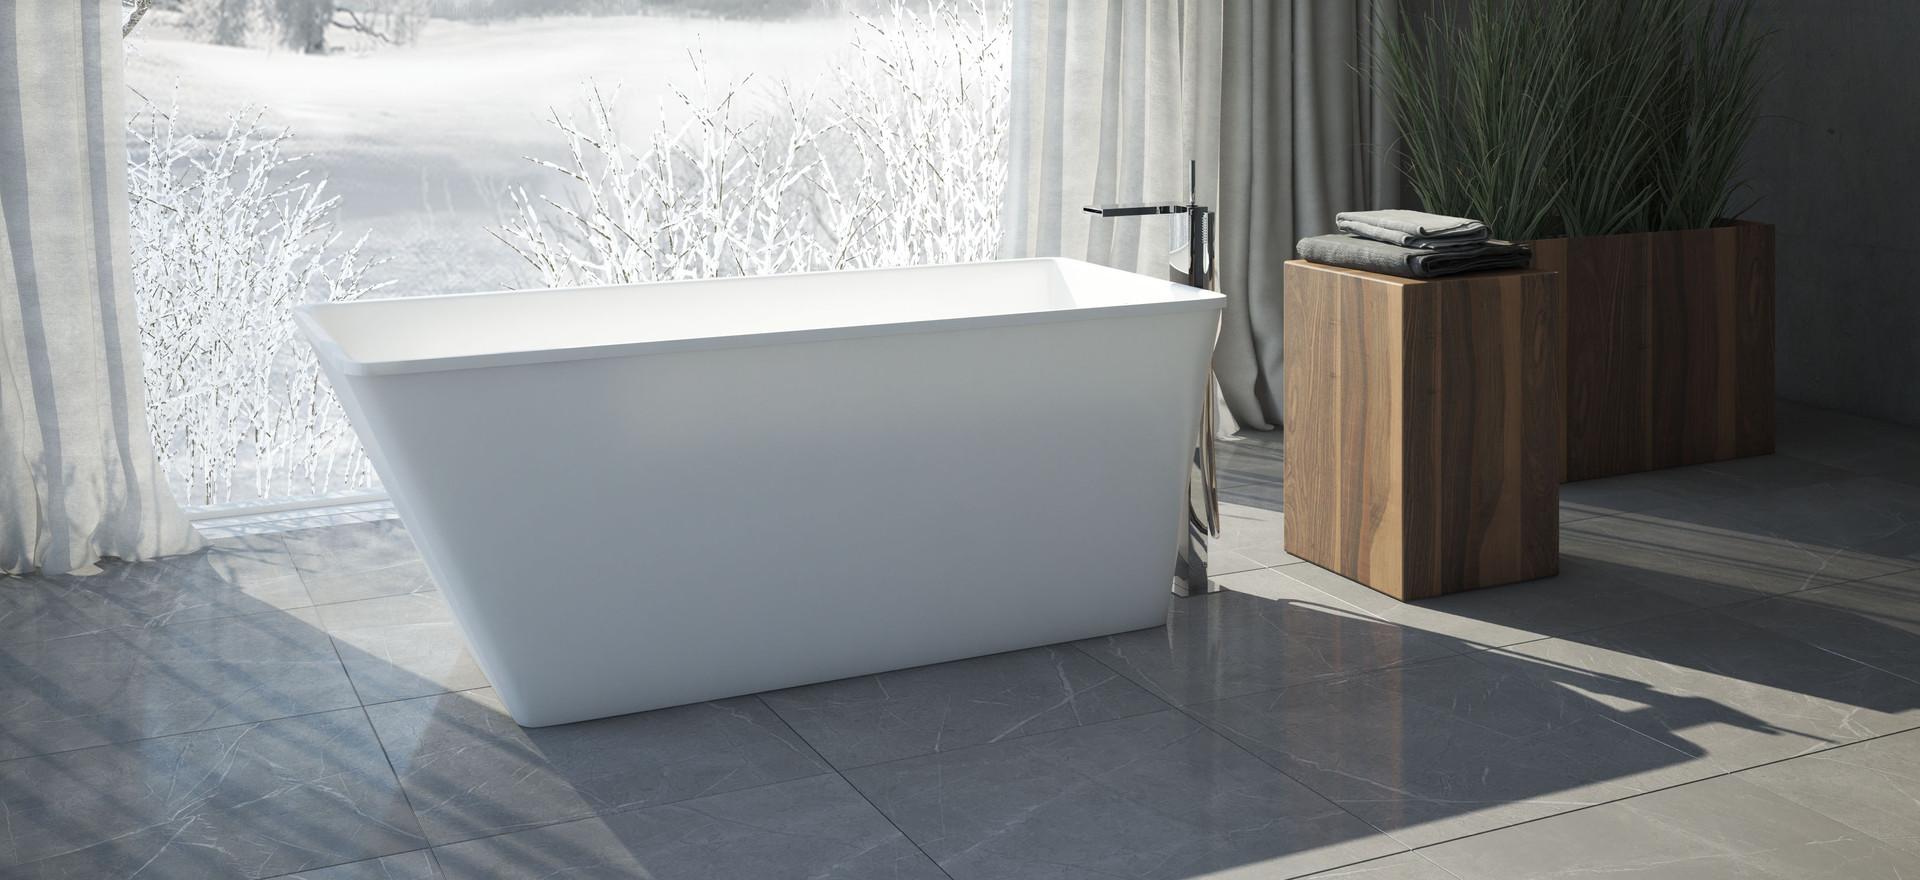 Fresstanding Bathtub CasaDiVanna